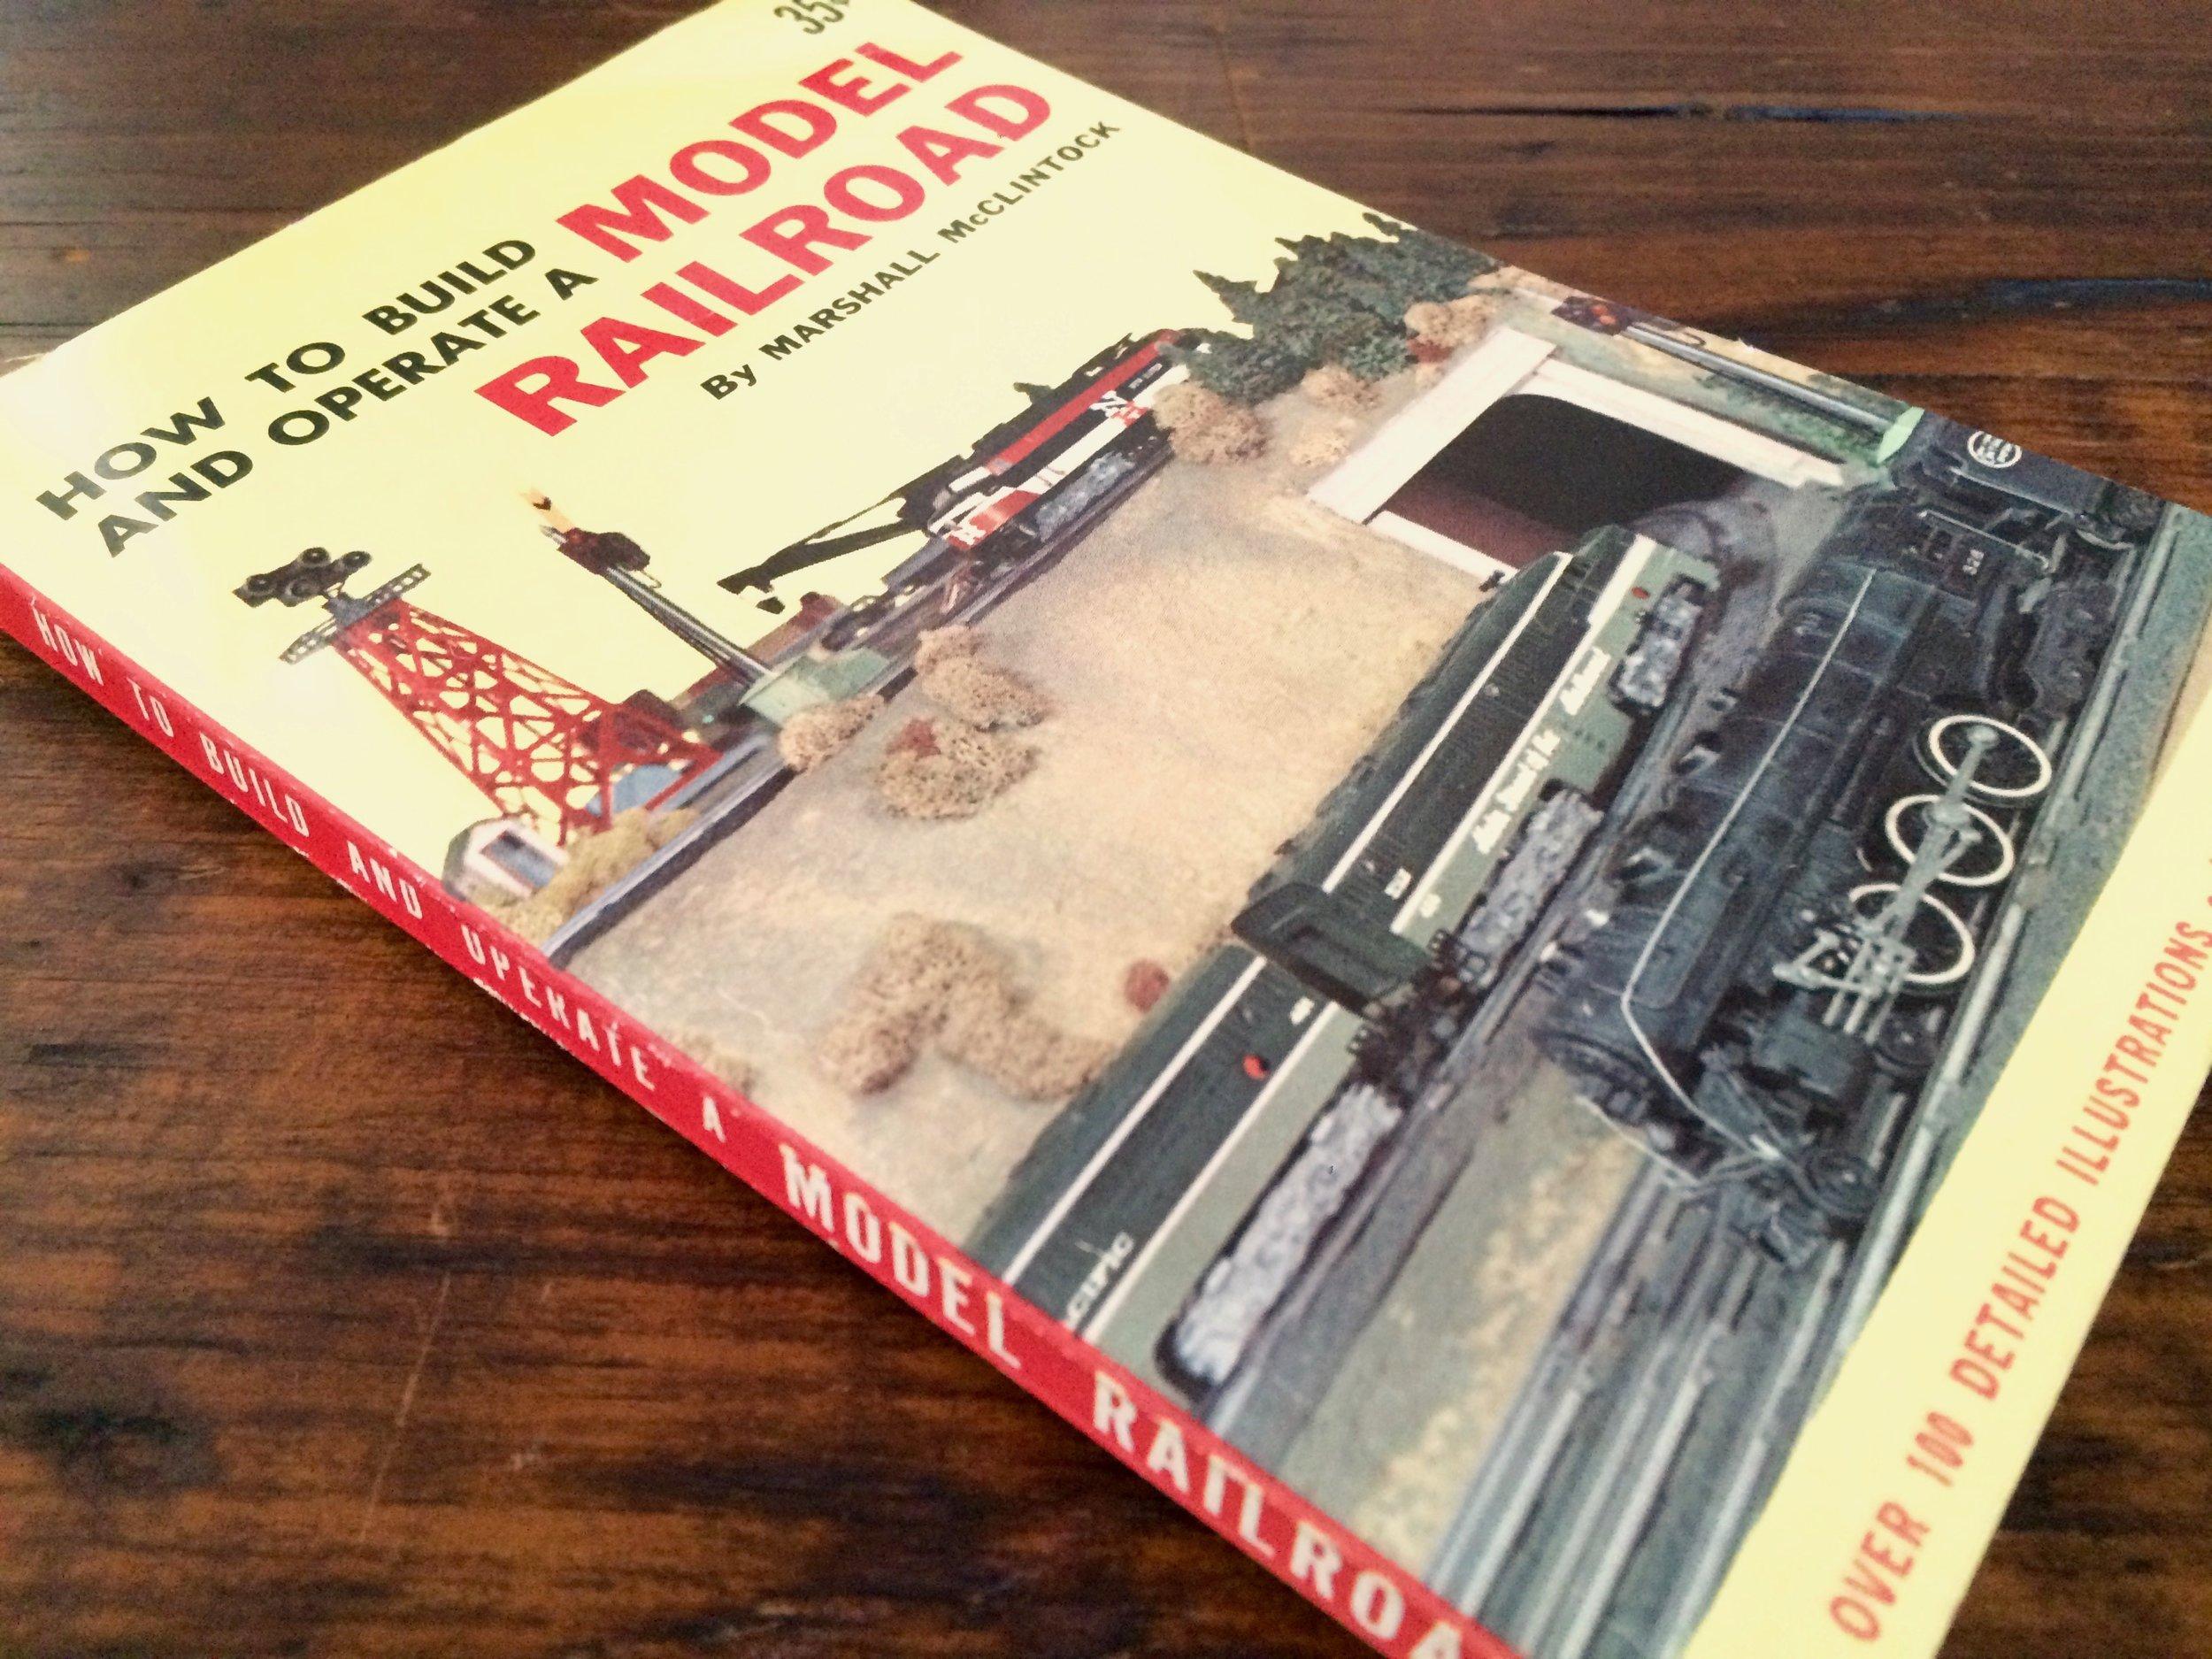 Model Railroad Book 1955